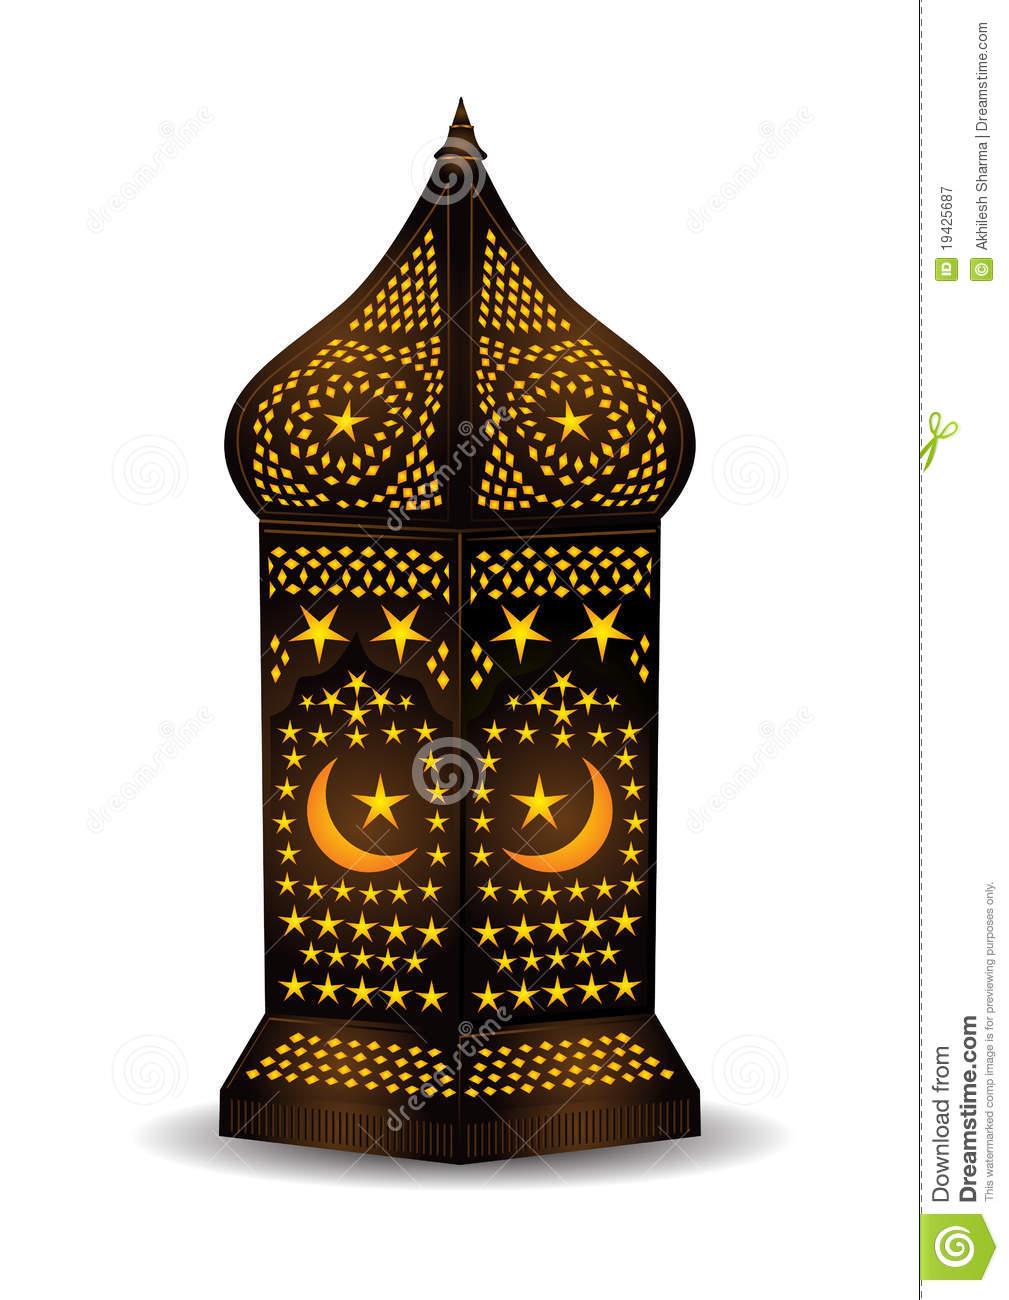 Ramadan cliparts.